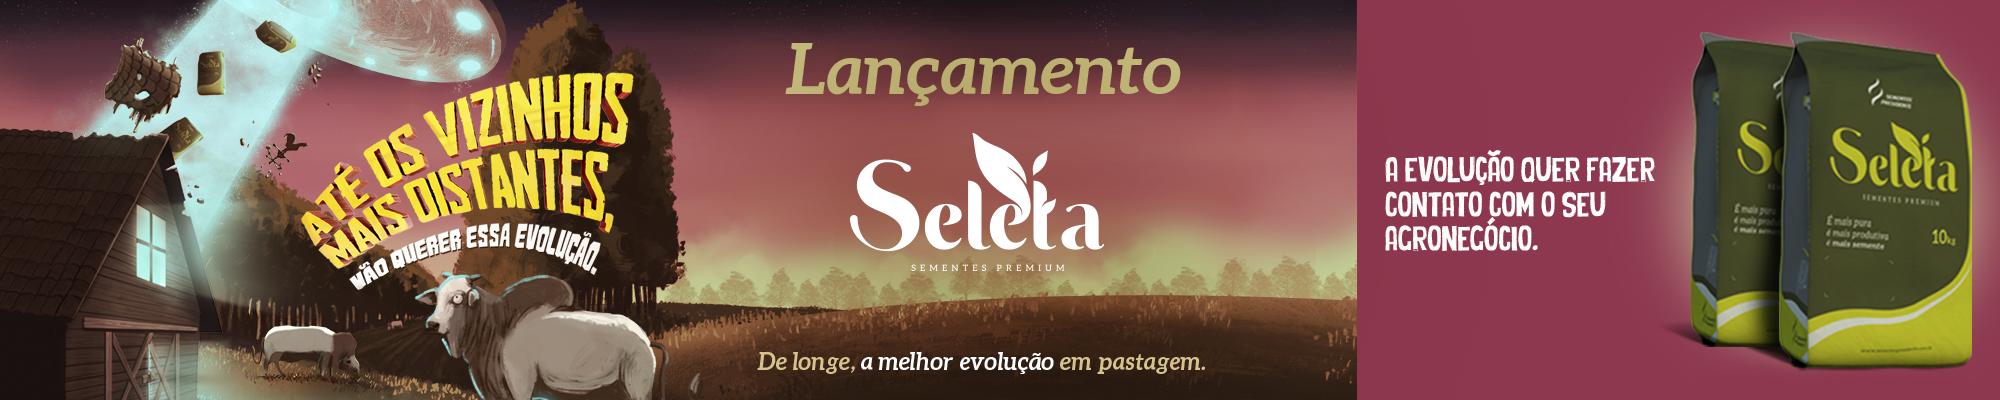 banner_lançamento_seleta